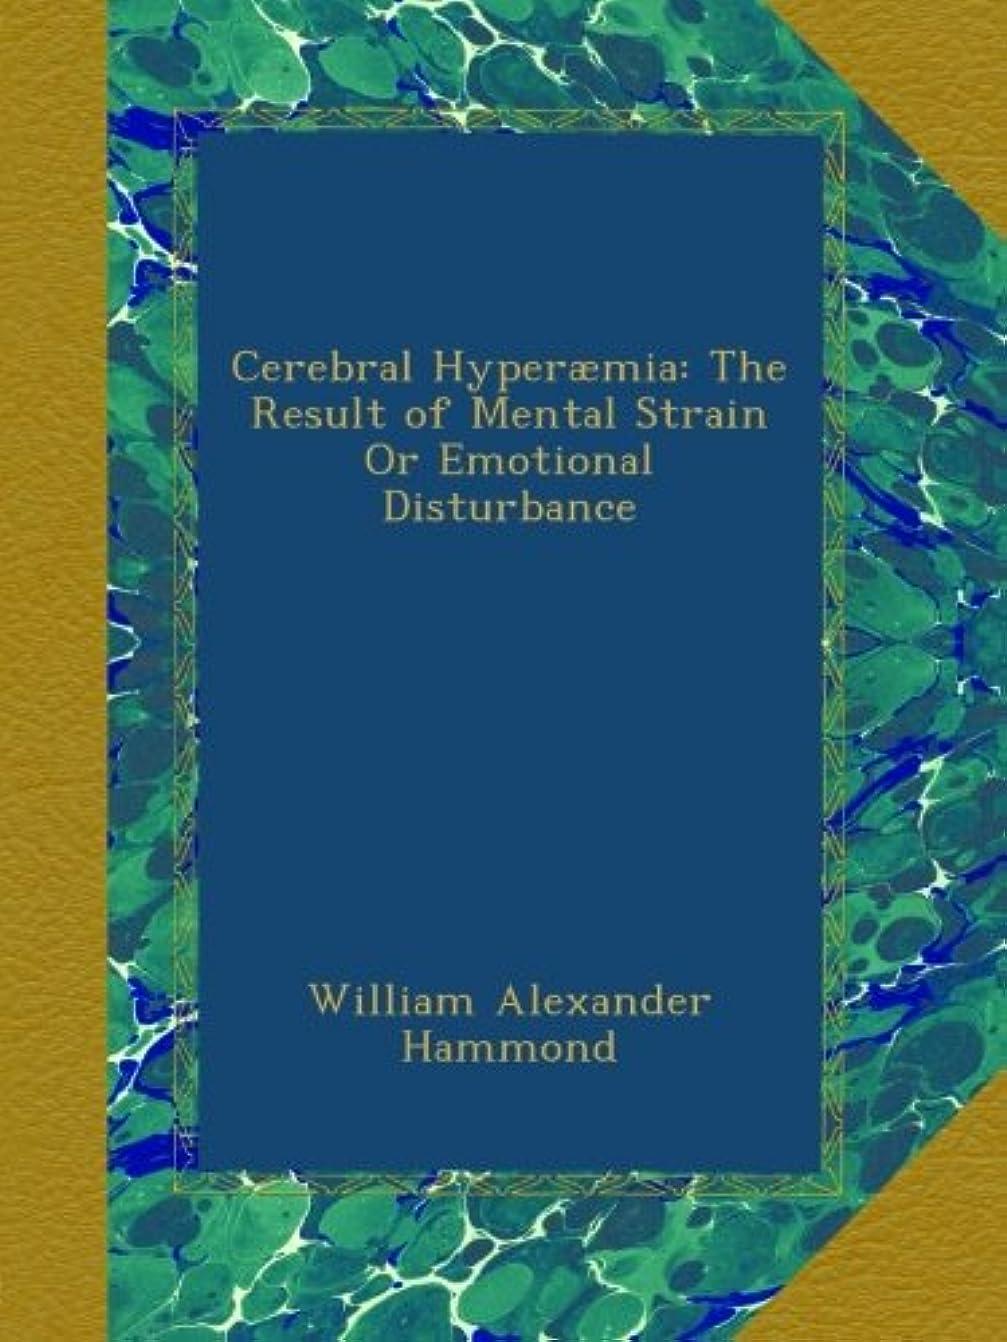 Cerebral Hyper?mia: The Result of Mental Strain Or Emotional Disturbance